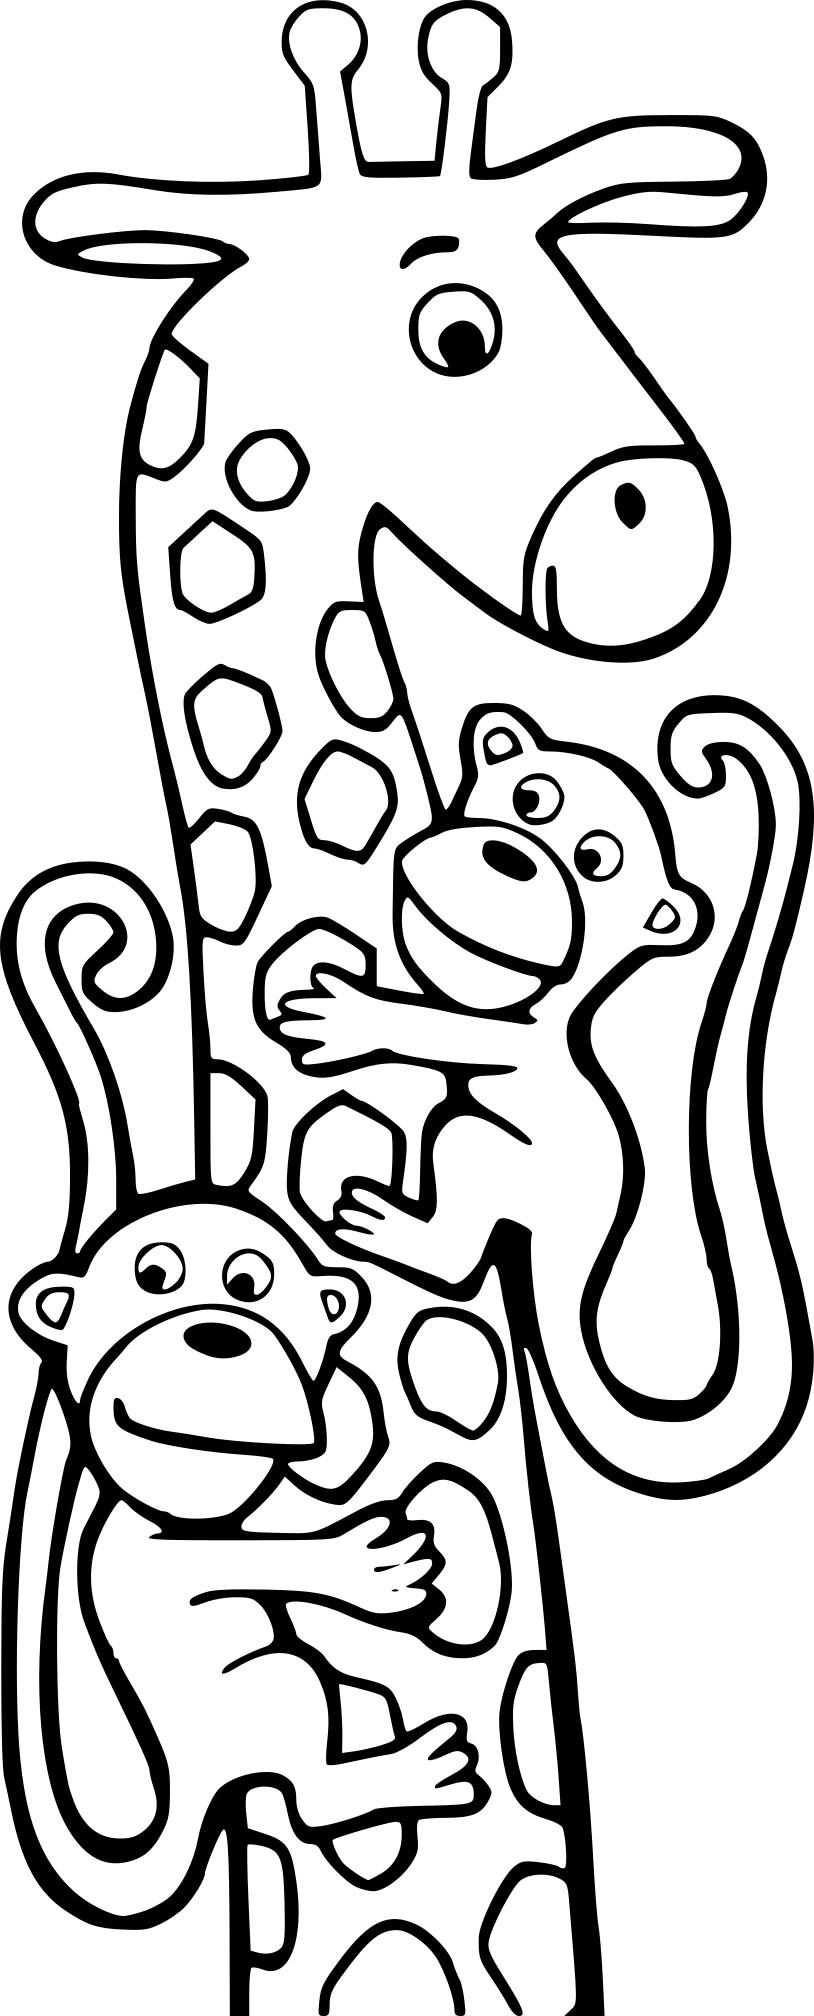 coloriage girafe et singe à imprimer